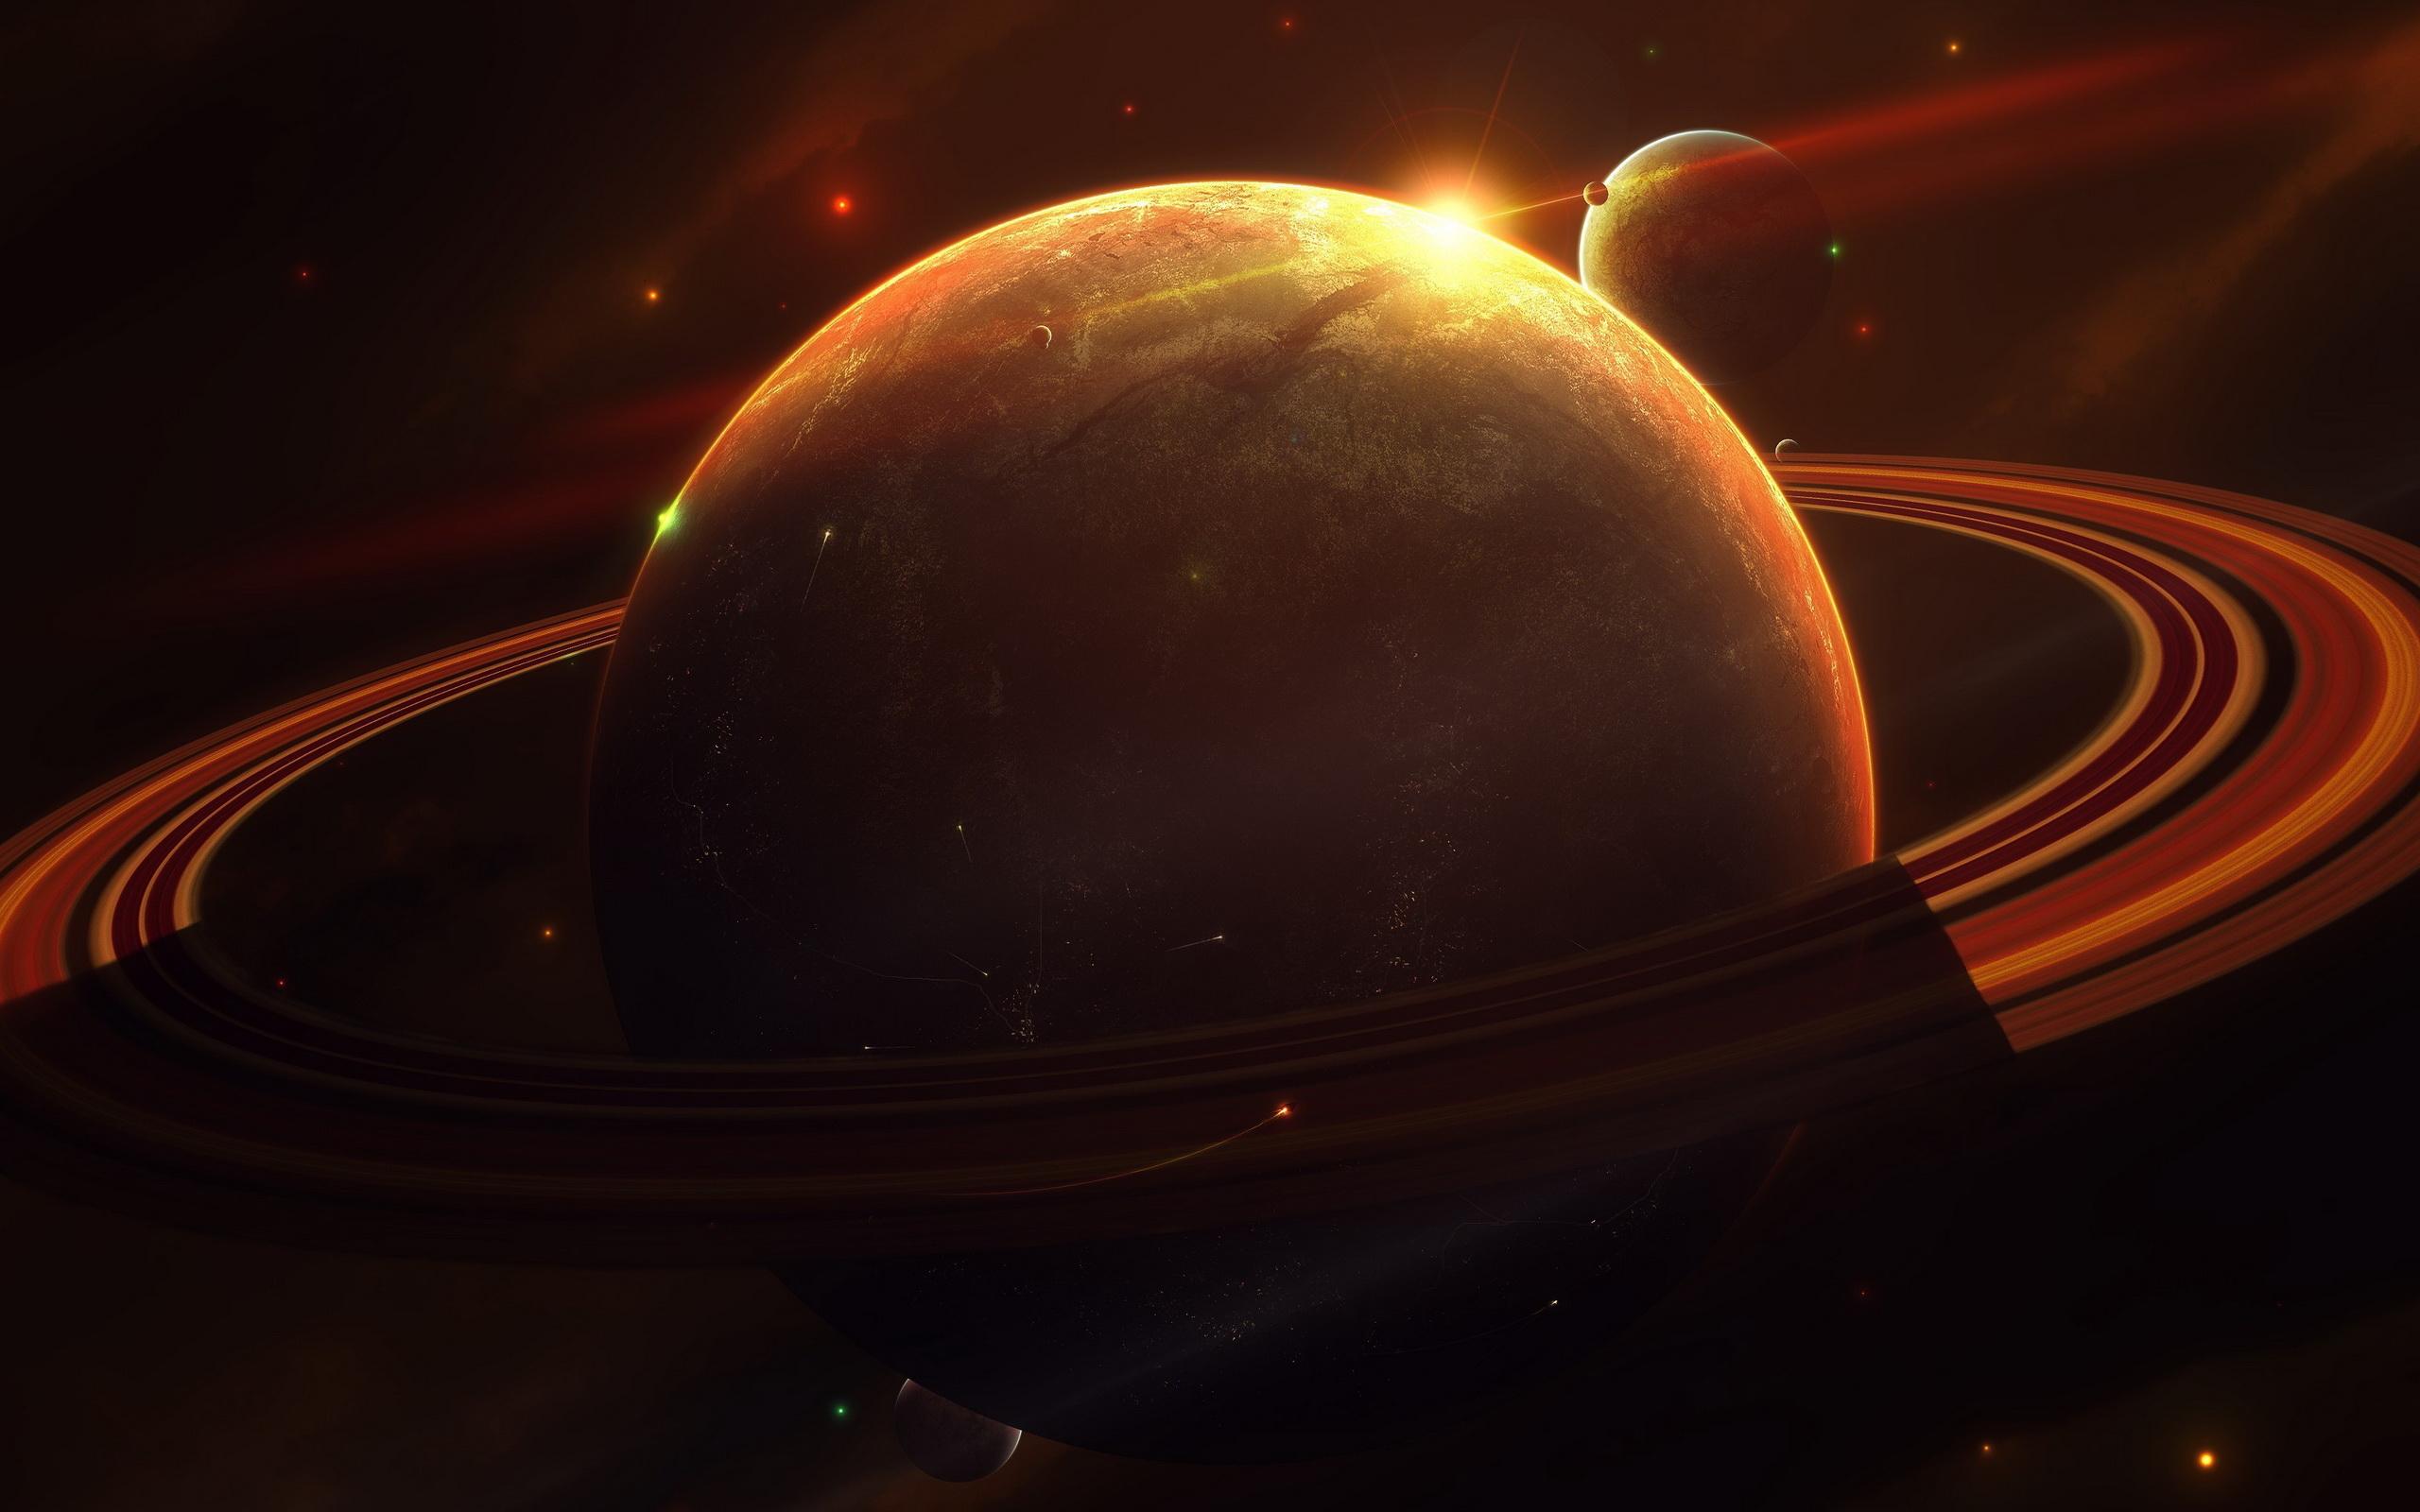 Картинки с планетой сатурн, вставками